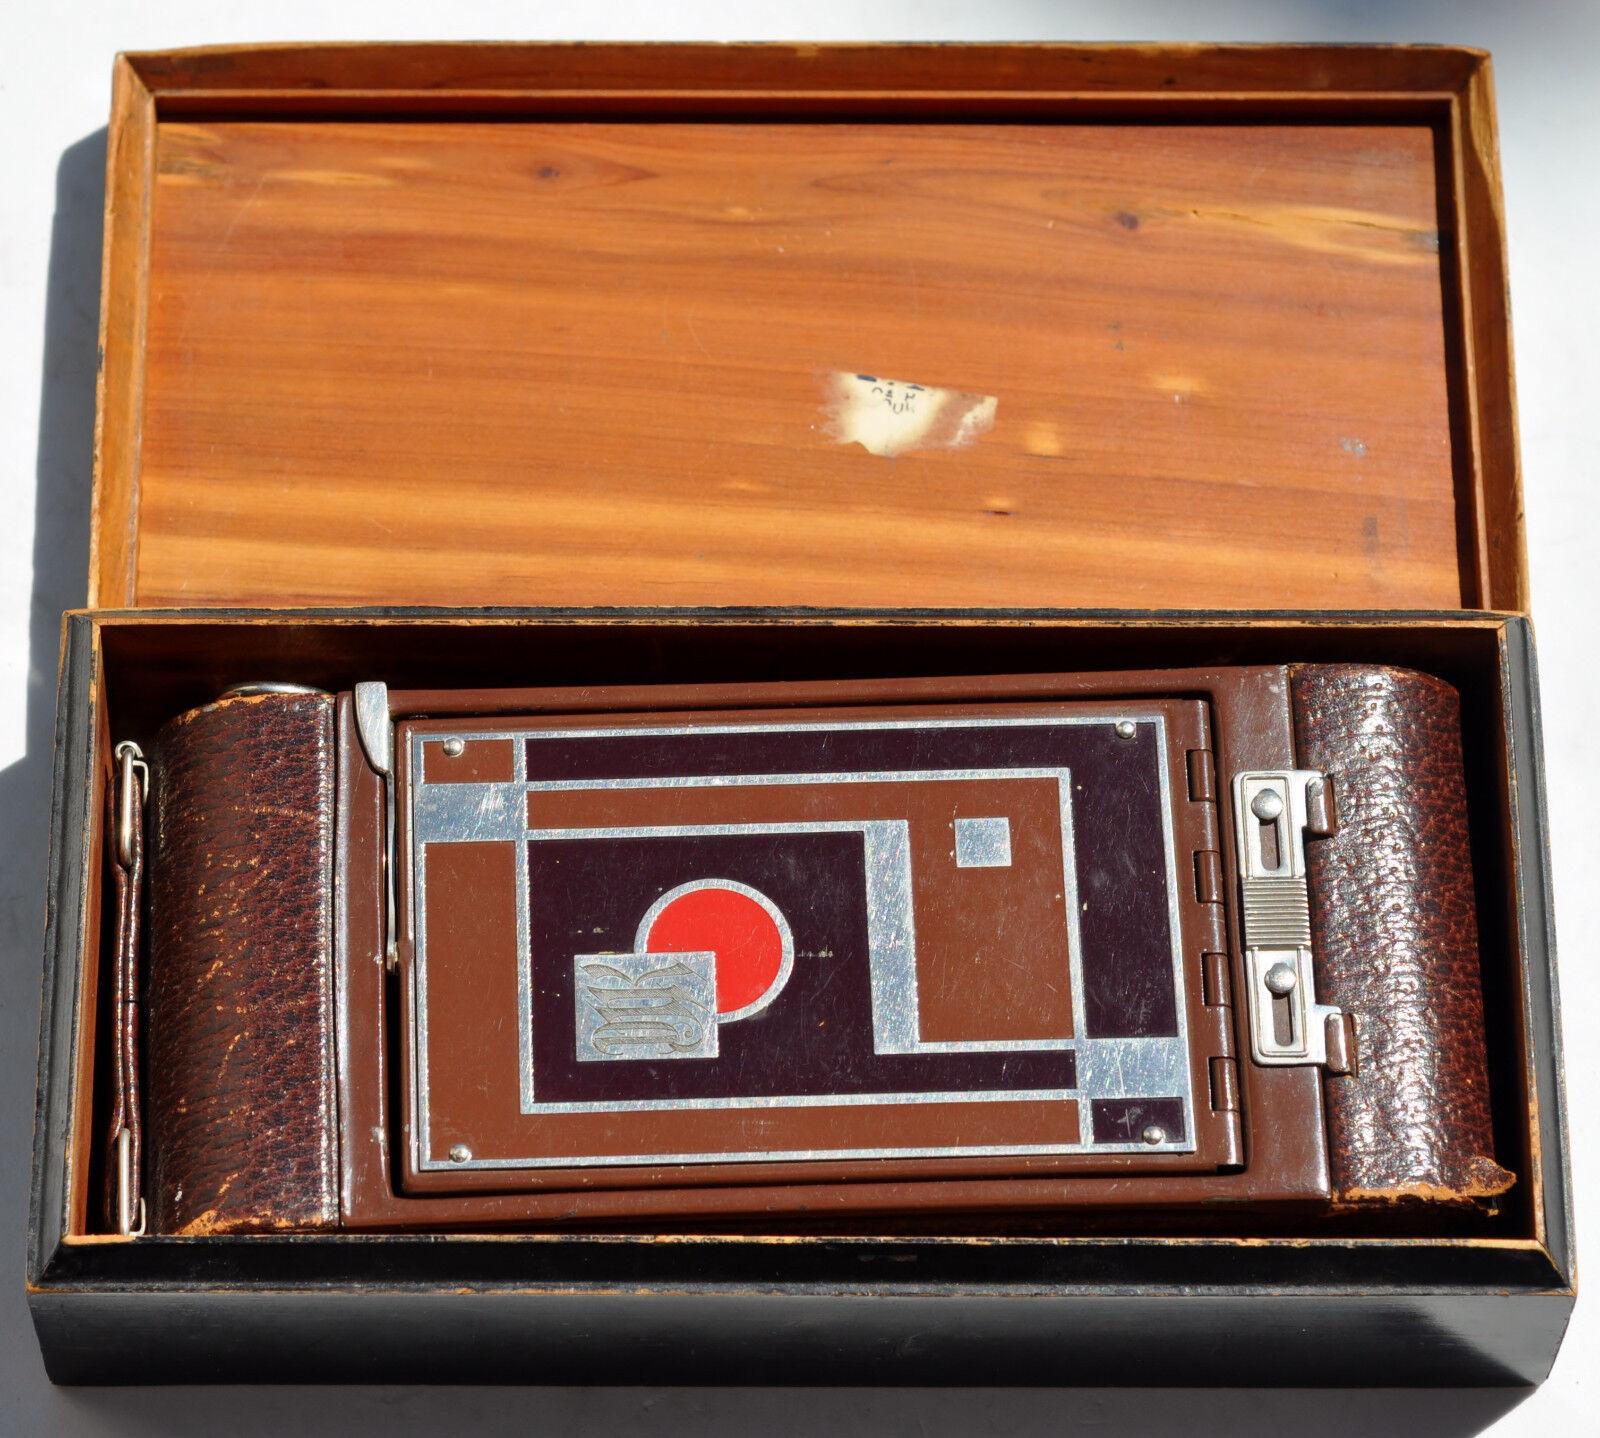 Kodak Vintage Art Deco Gift Folding Camera Model 1A With Wooden Box